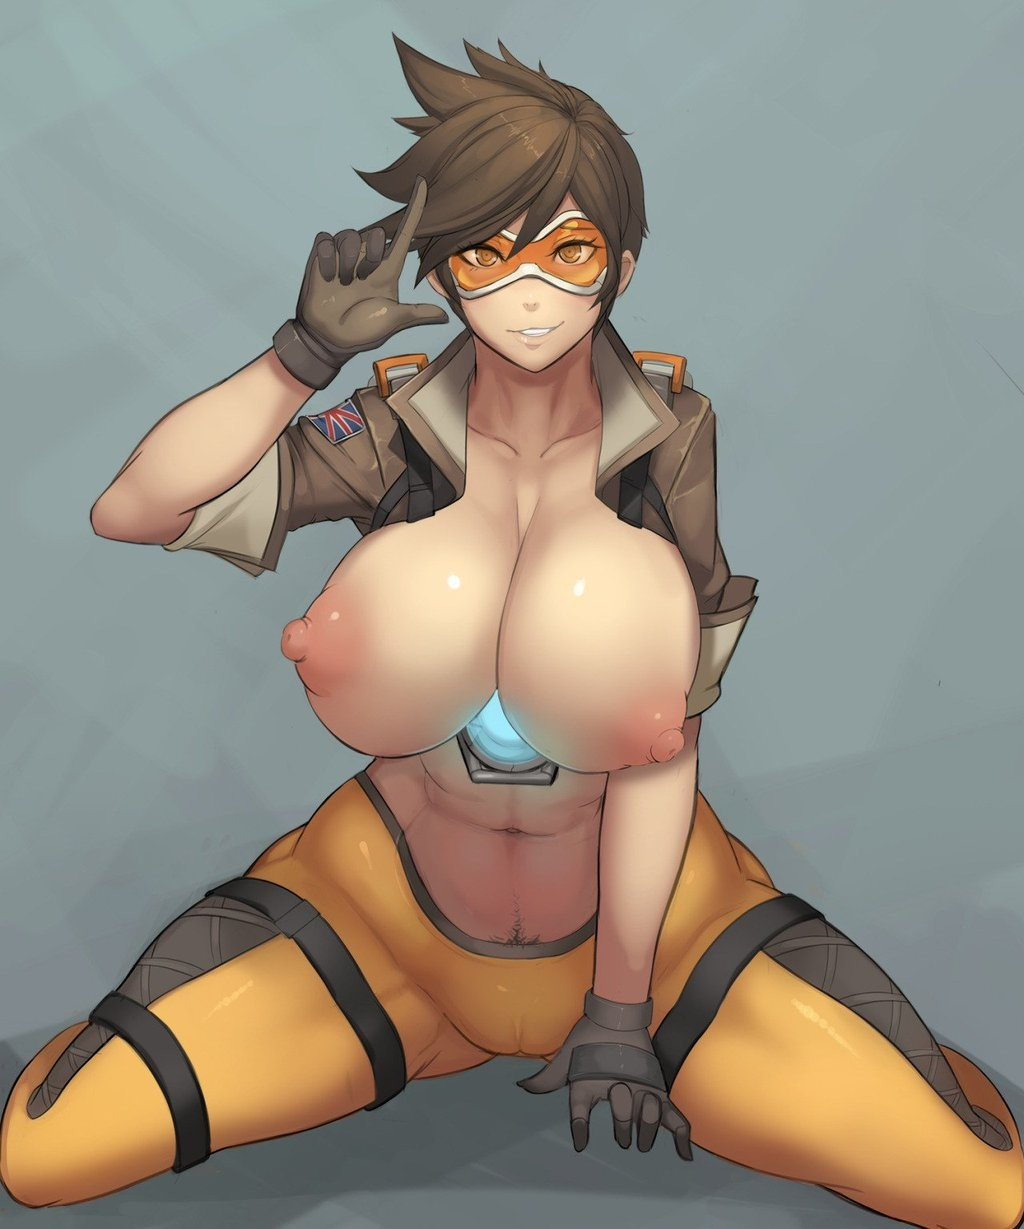 Overwatch porn manga